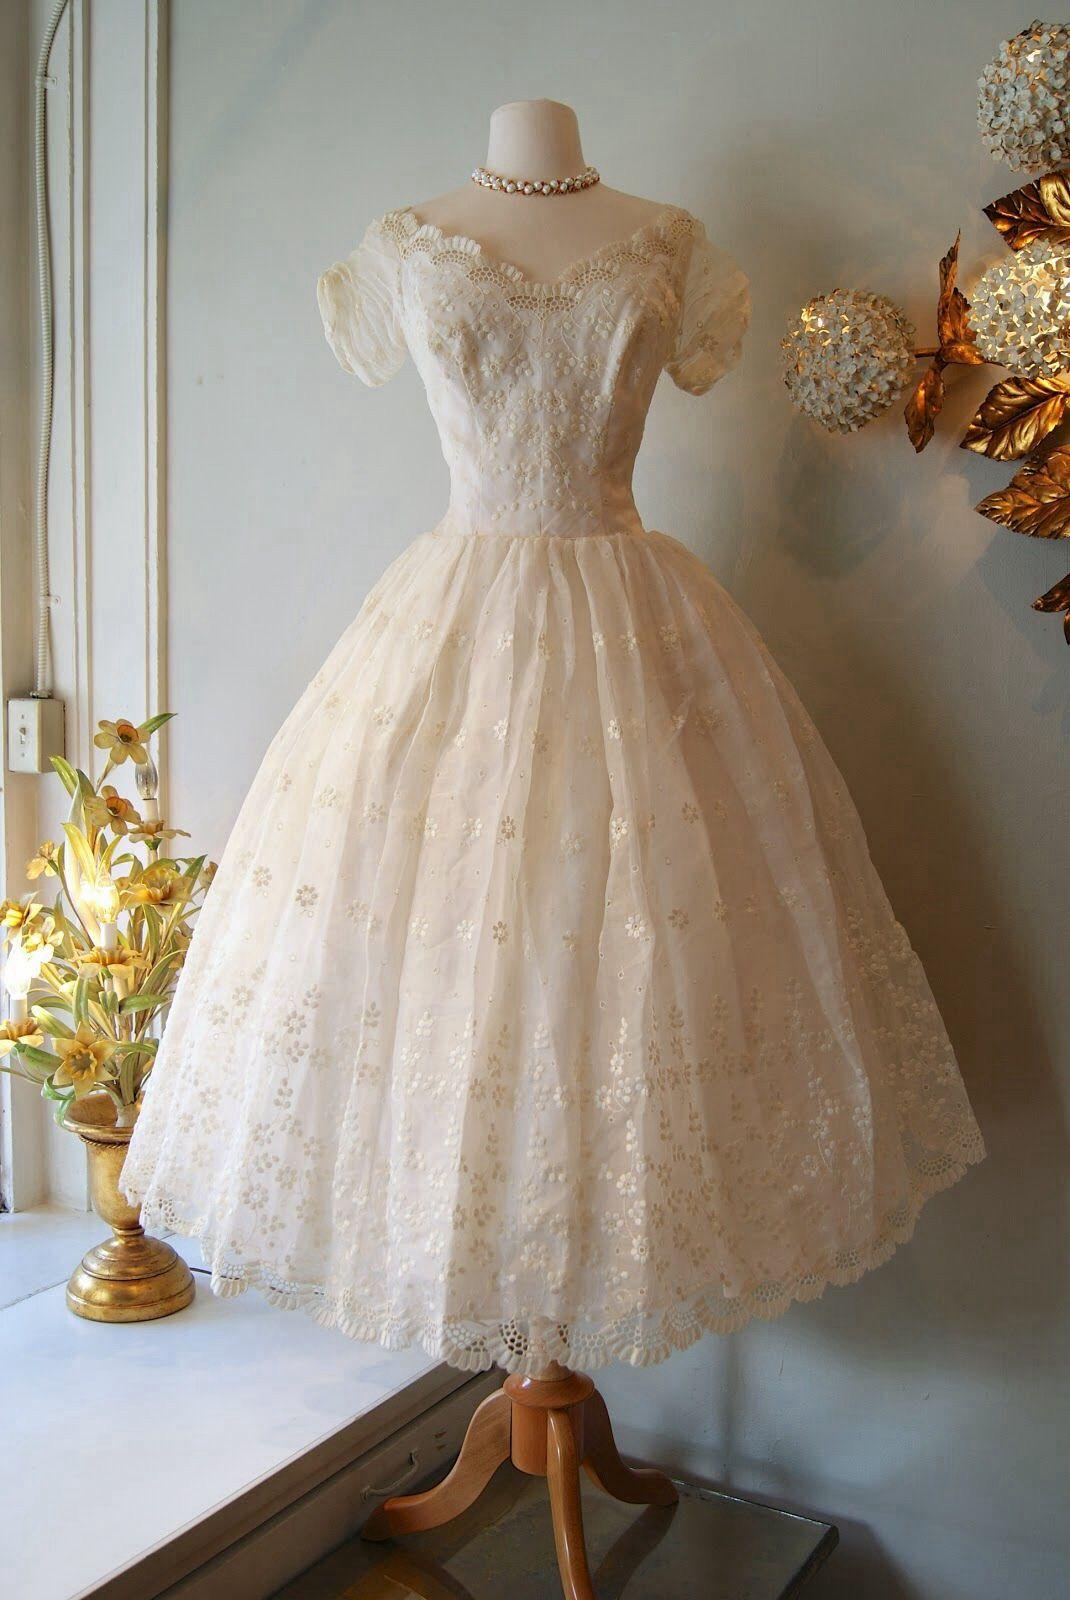 Vintage Dresses, Tea length wedding dress, Vintage dresses